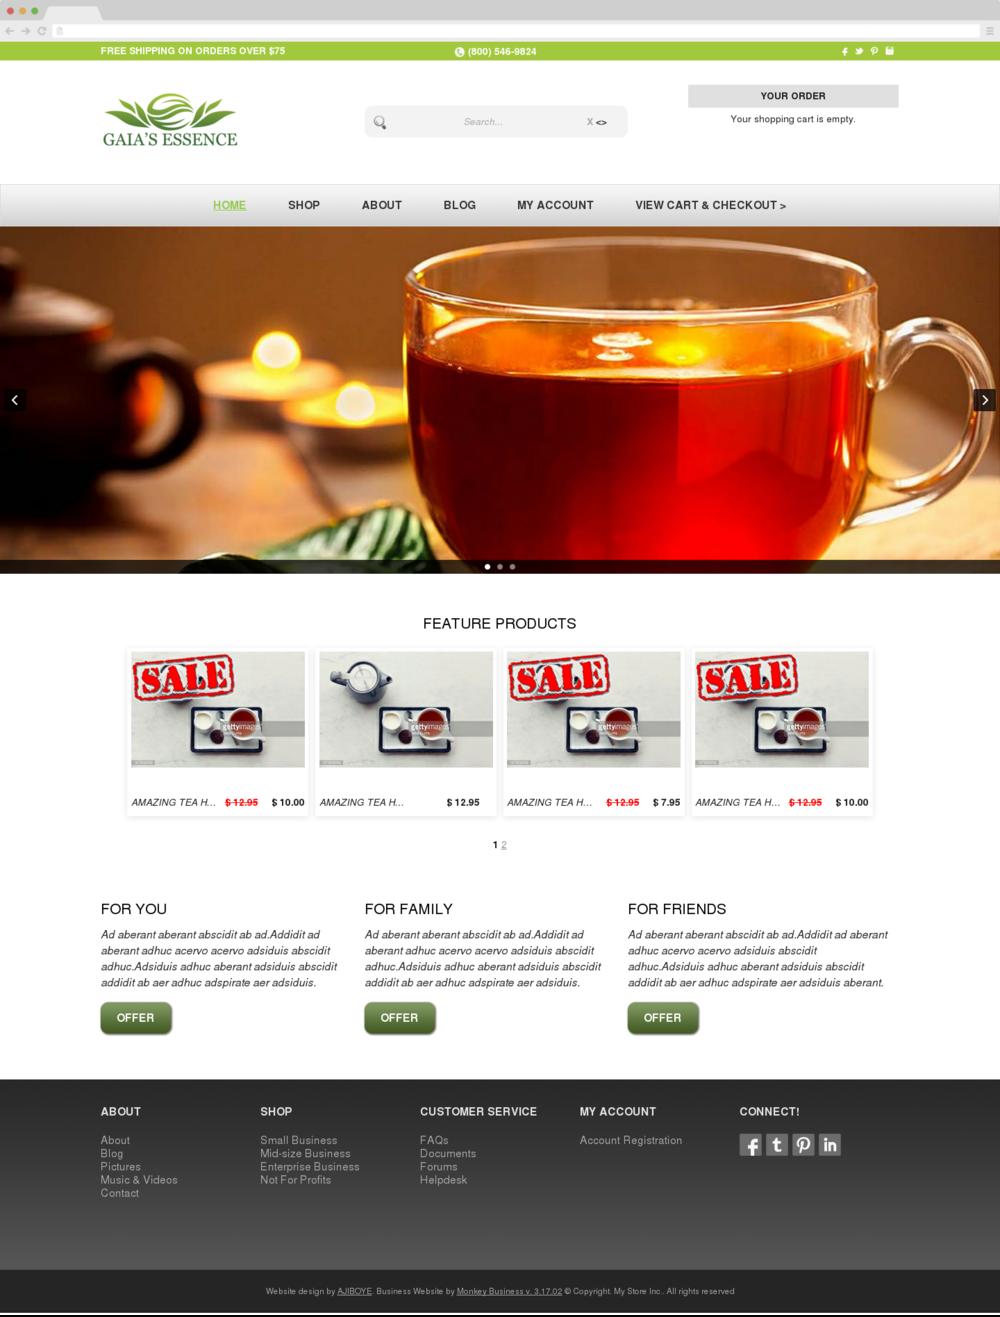 Monkey eStore - a Custom Website Design Theme for Monkey Business